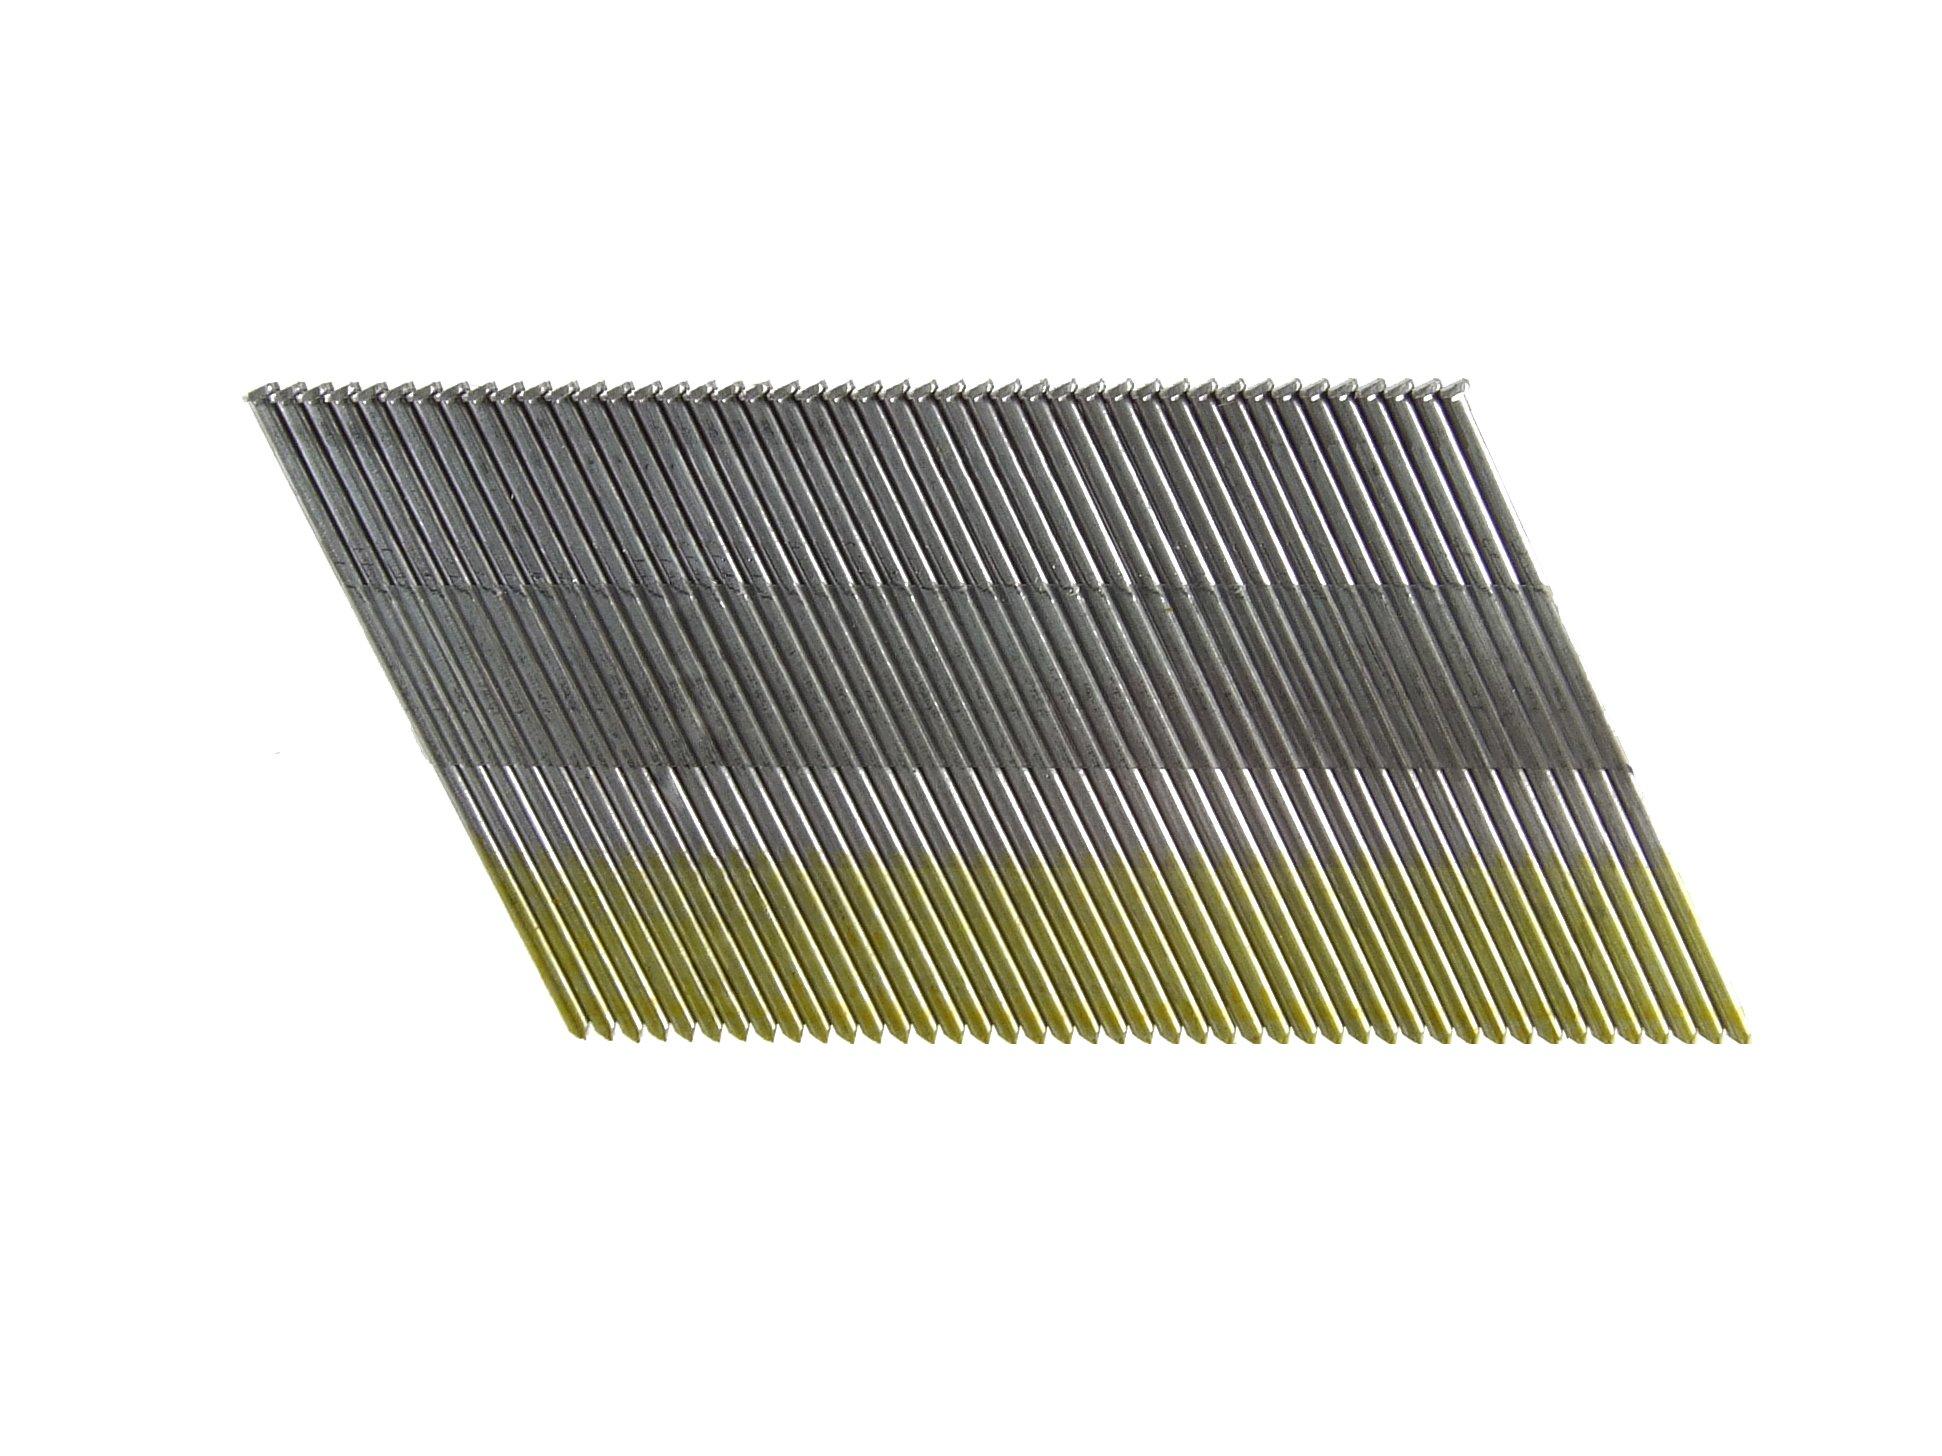 B&C Eagle BFN-2G 2-Inch x 25 Degree Galvanized Angle Finish Nails (3,500 per box)